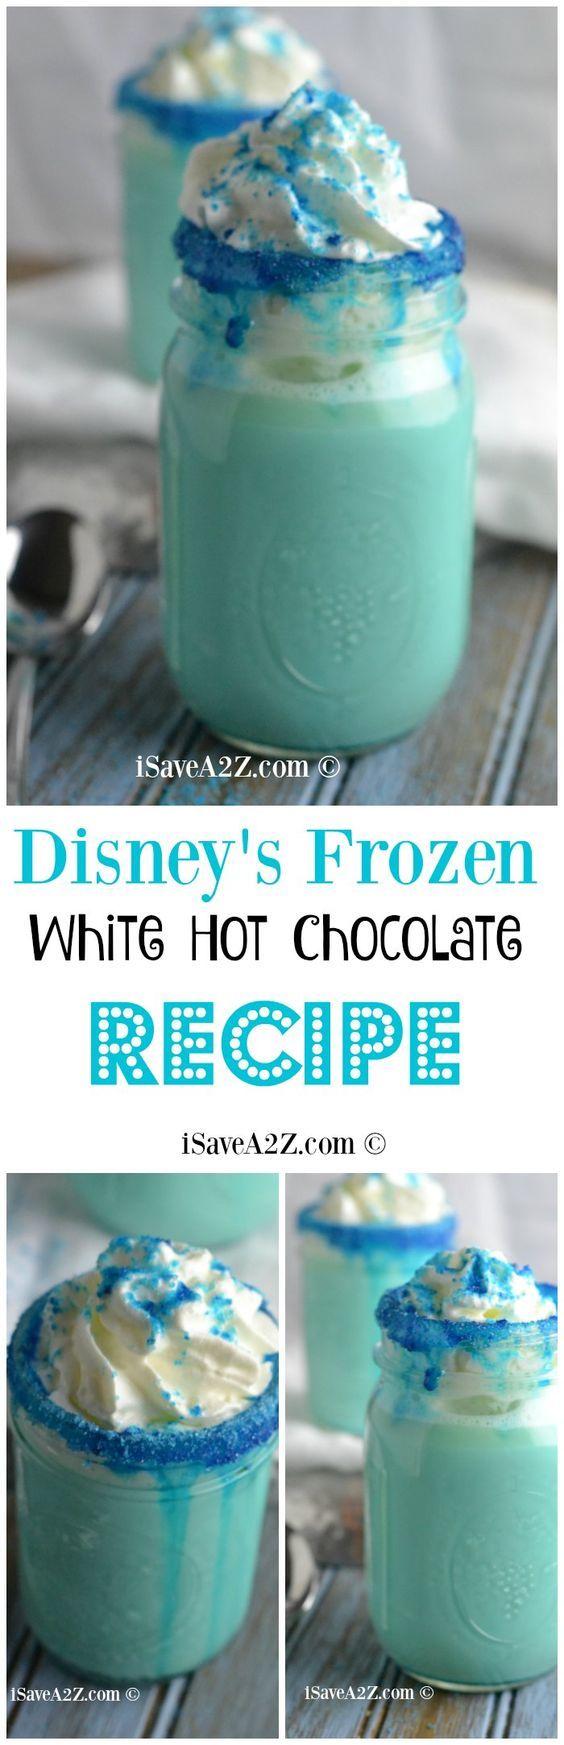 Disney's Frozen Movie Inspired Recipe: Best White Hot Chocolate Recipe